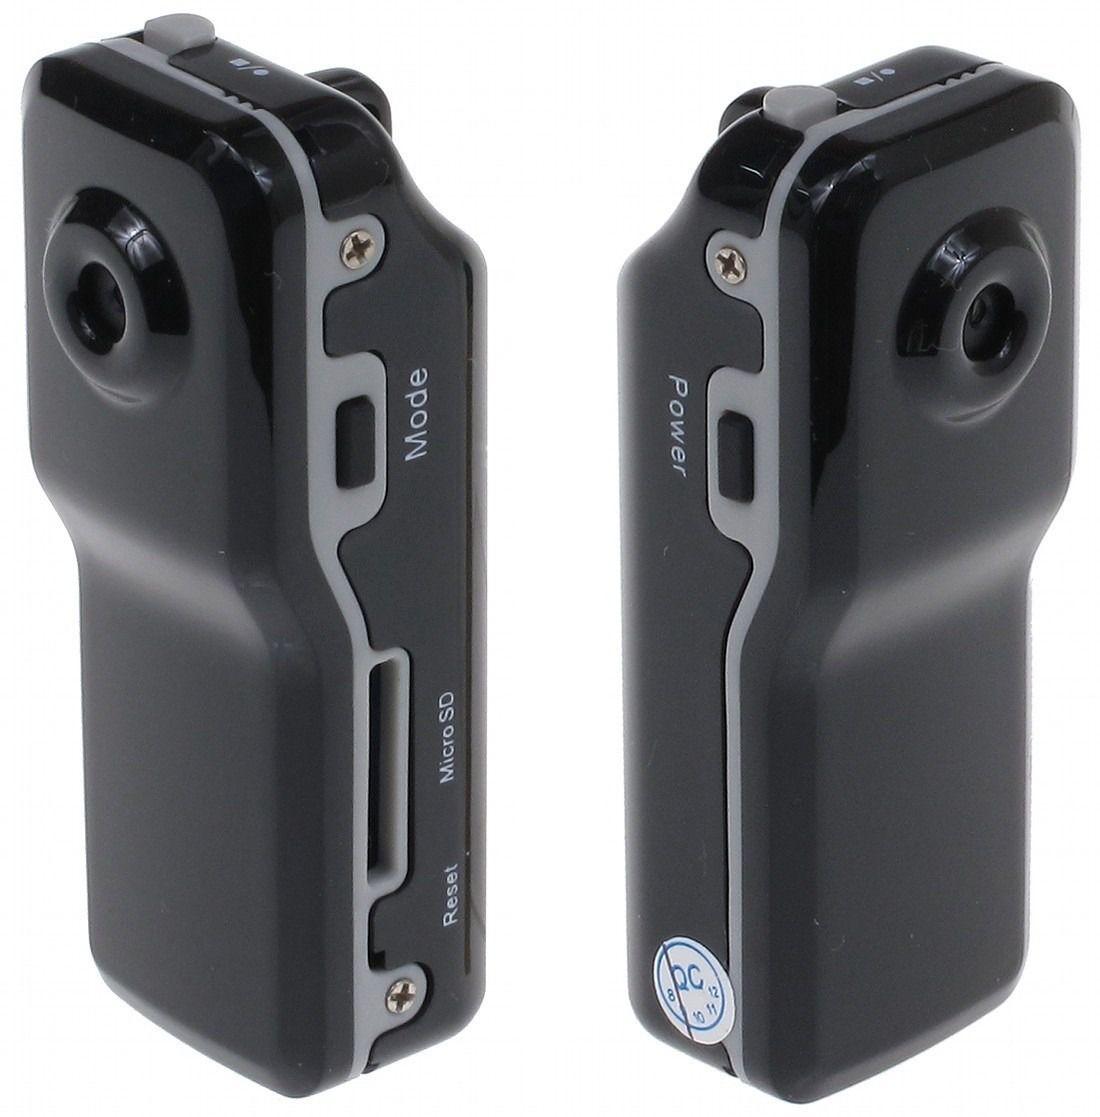 Mini câmera gravador espiã  - Thata Esportes